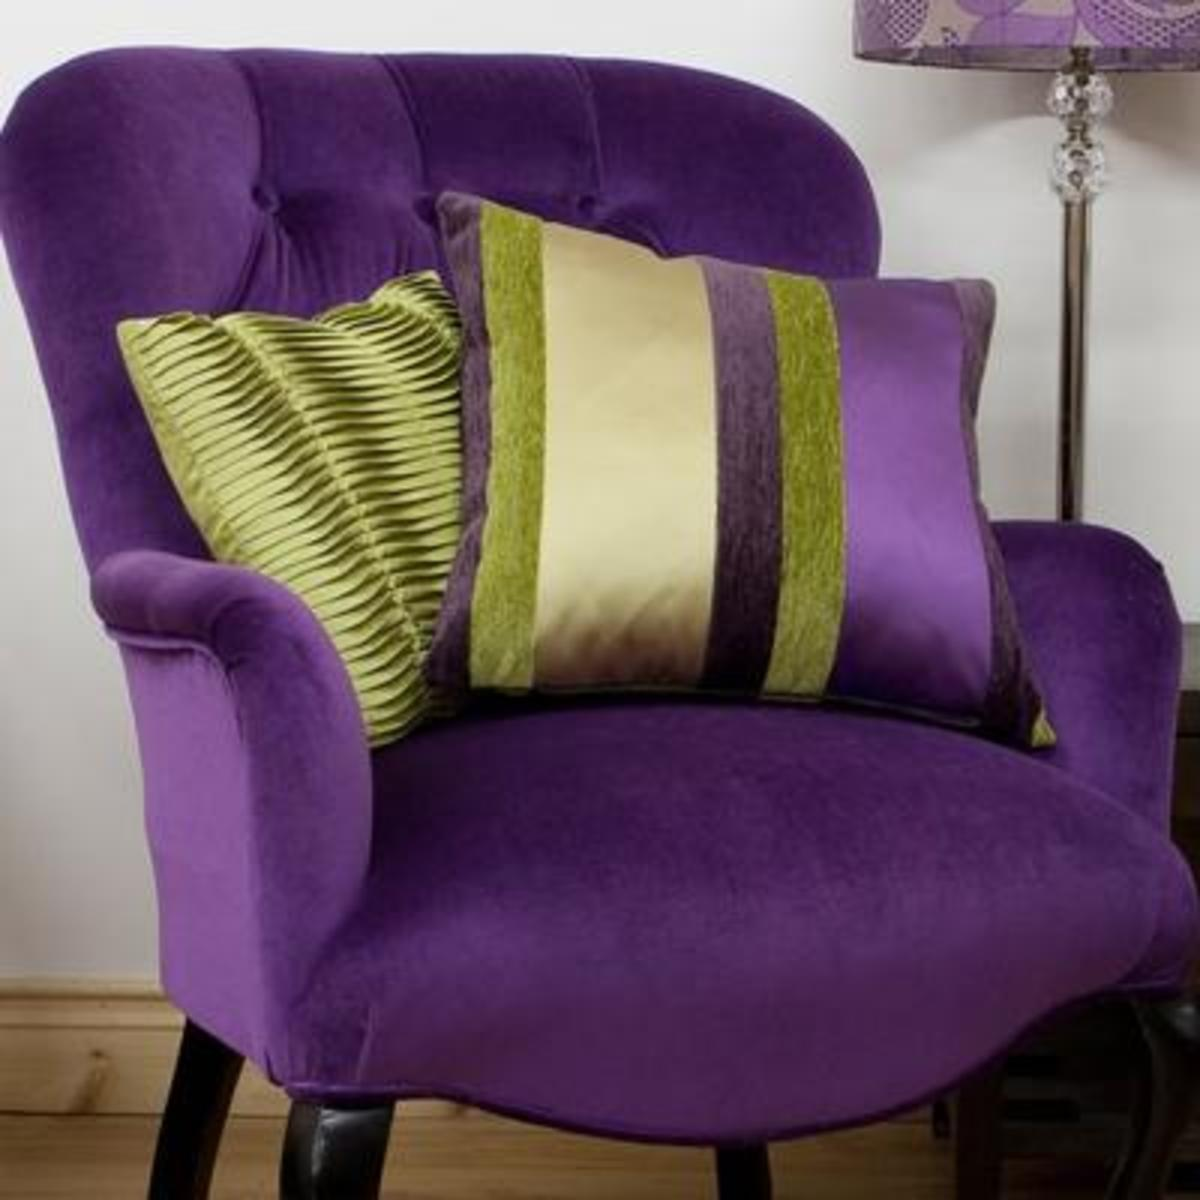 Lime Green & Purple